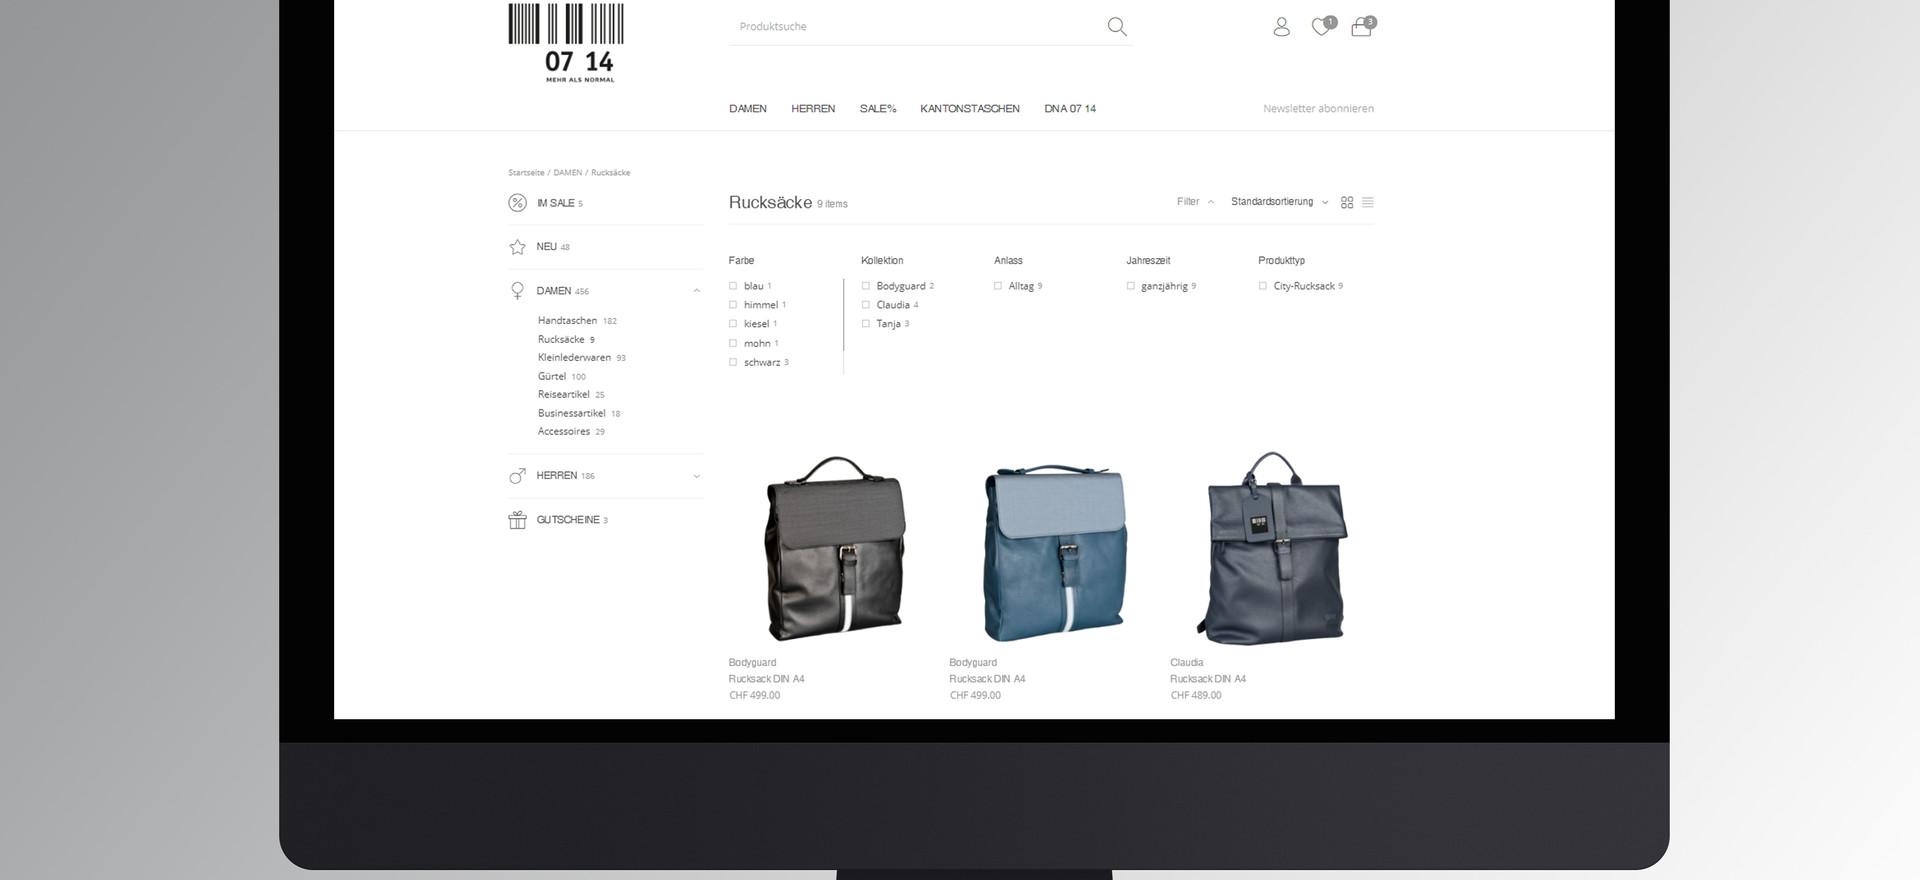 0714 Shop Navi/Filter